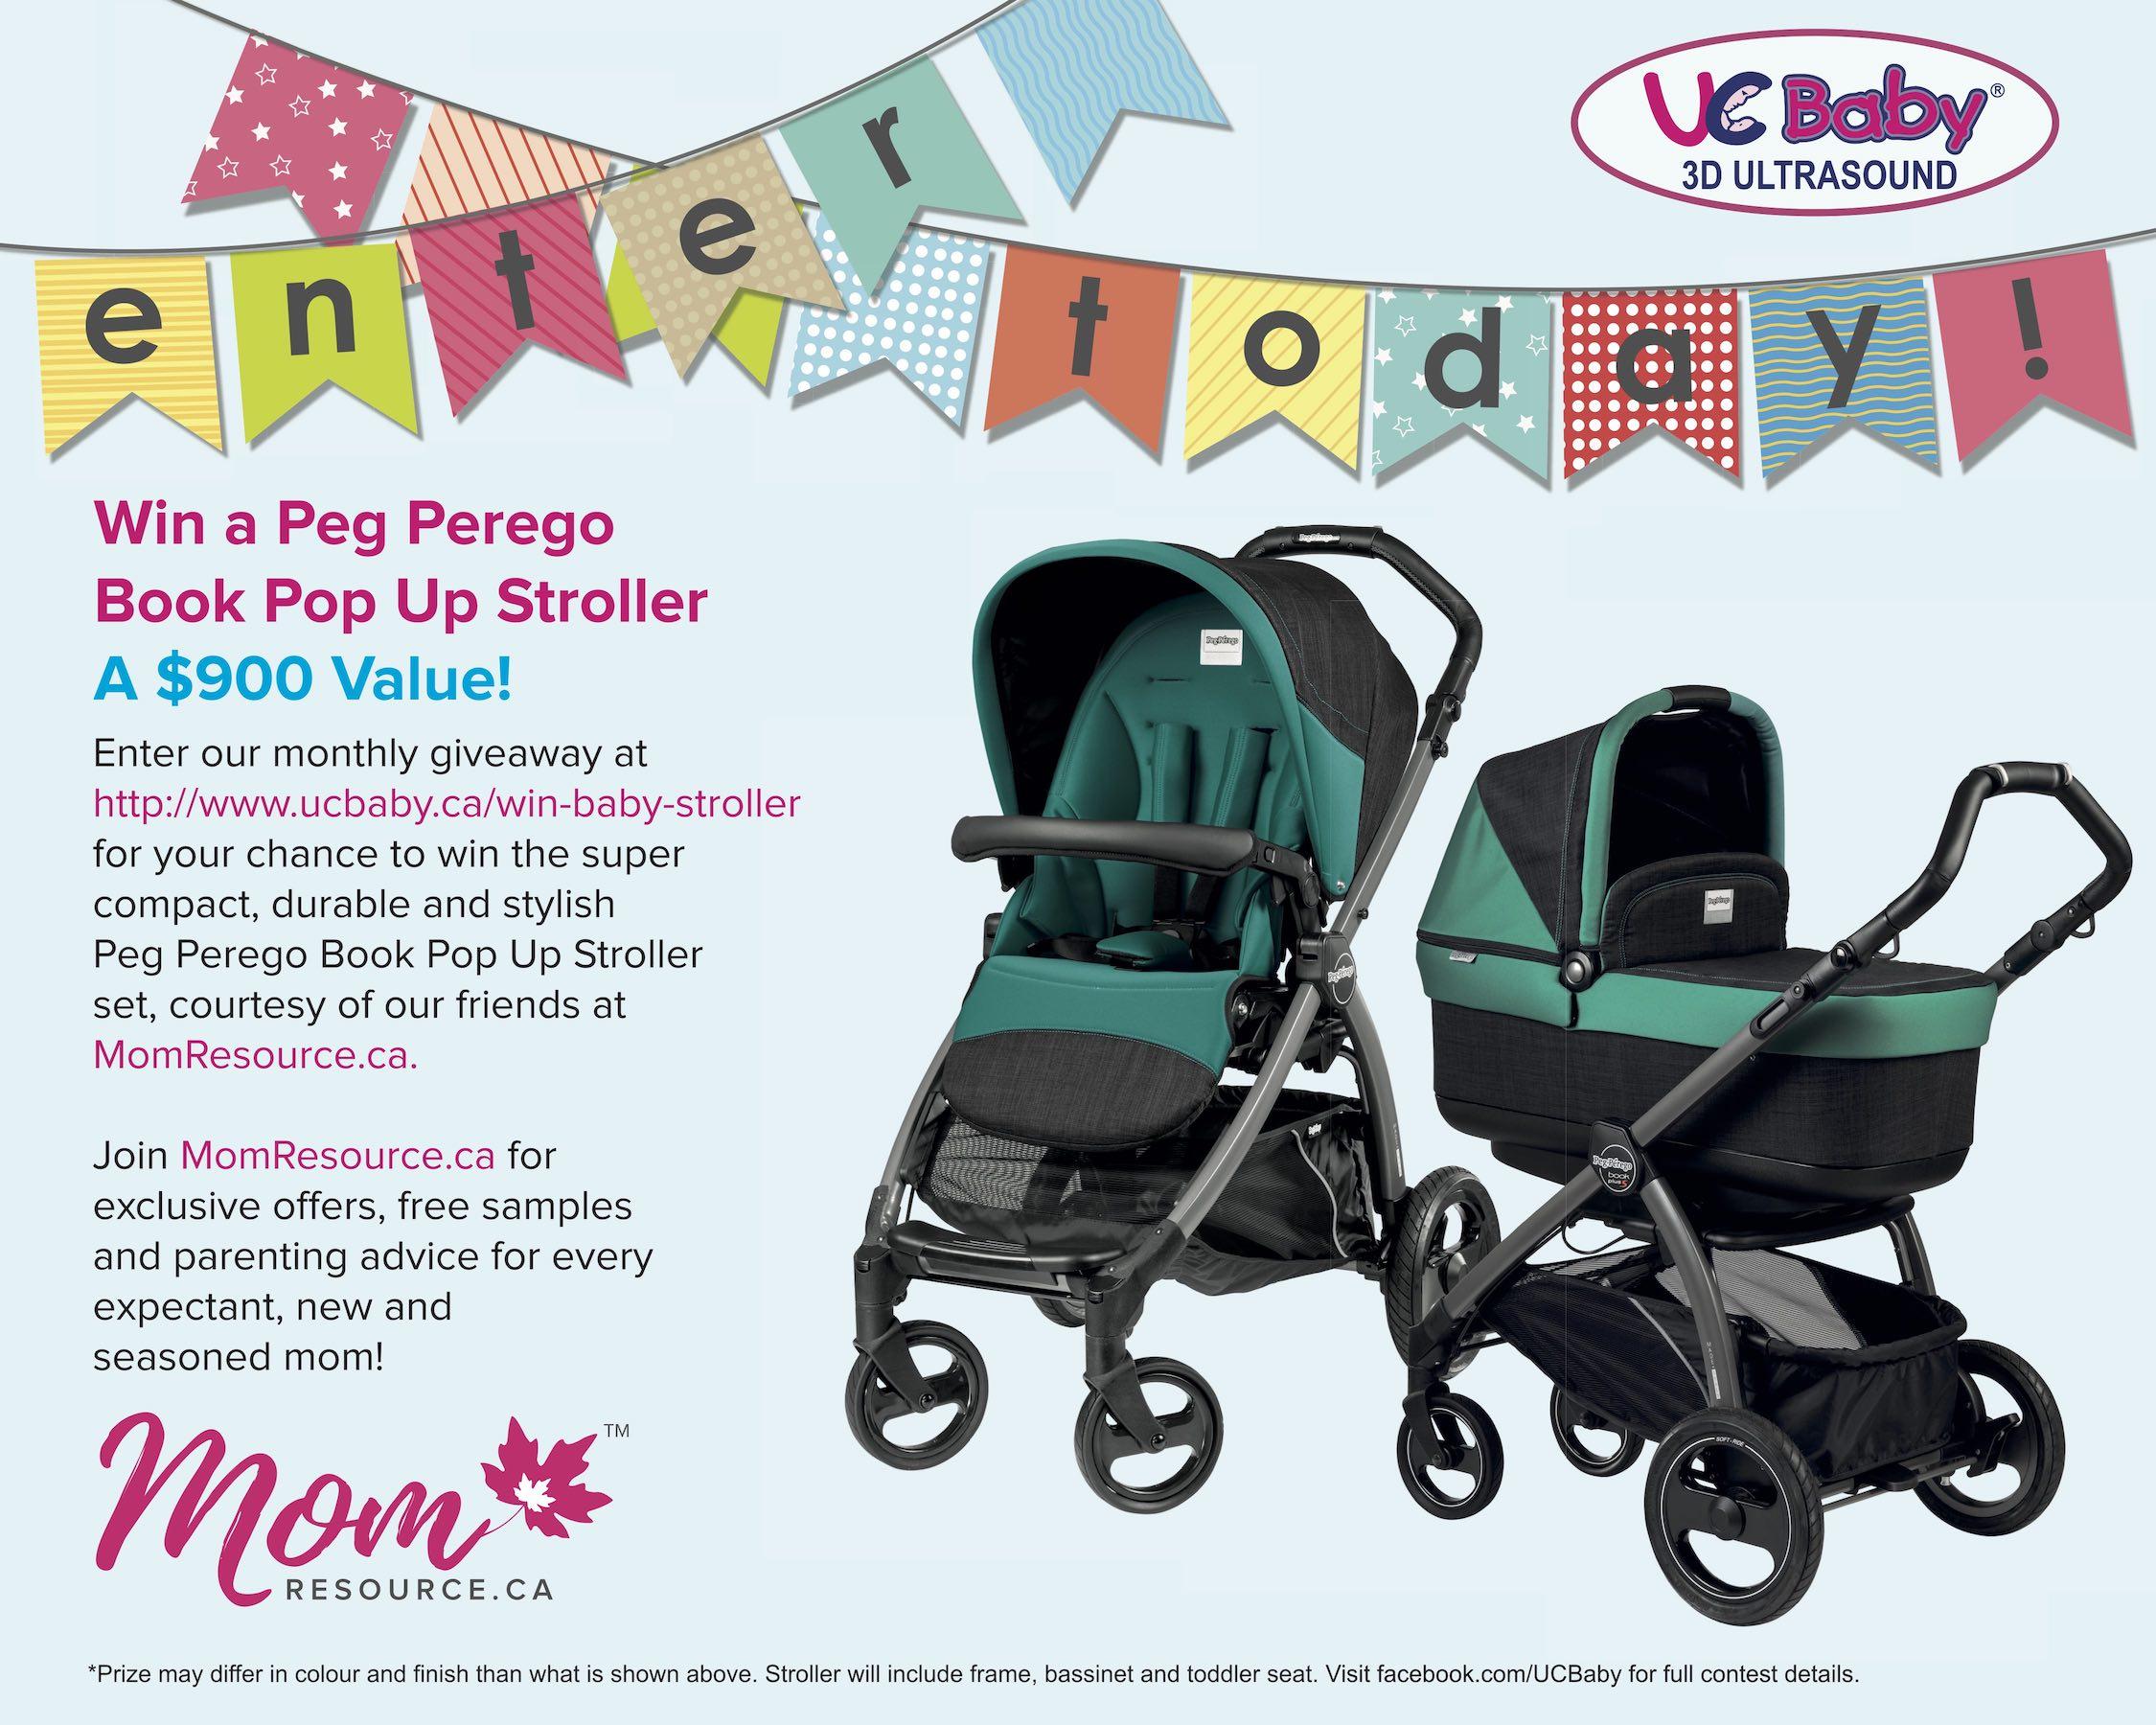 UC Baby Peg Perego Baby Stroller